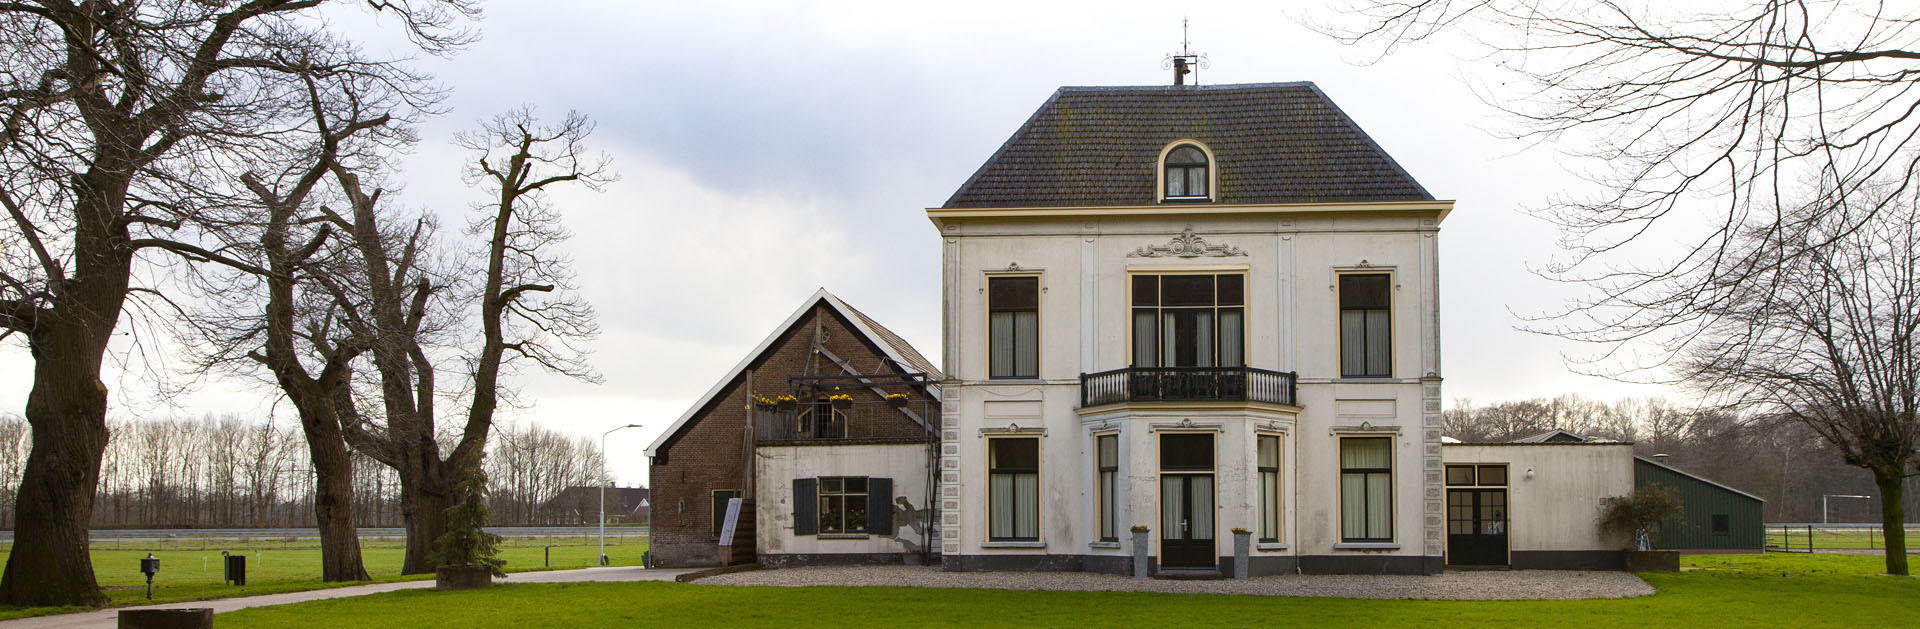 Landgoed Tandem - Westendorp Regio Achterhoek - Liemers